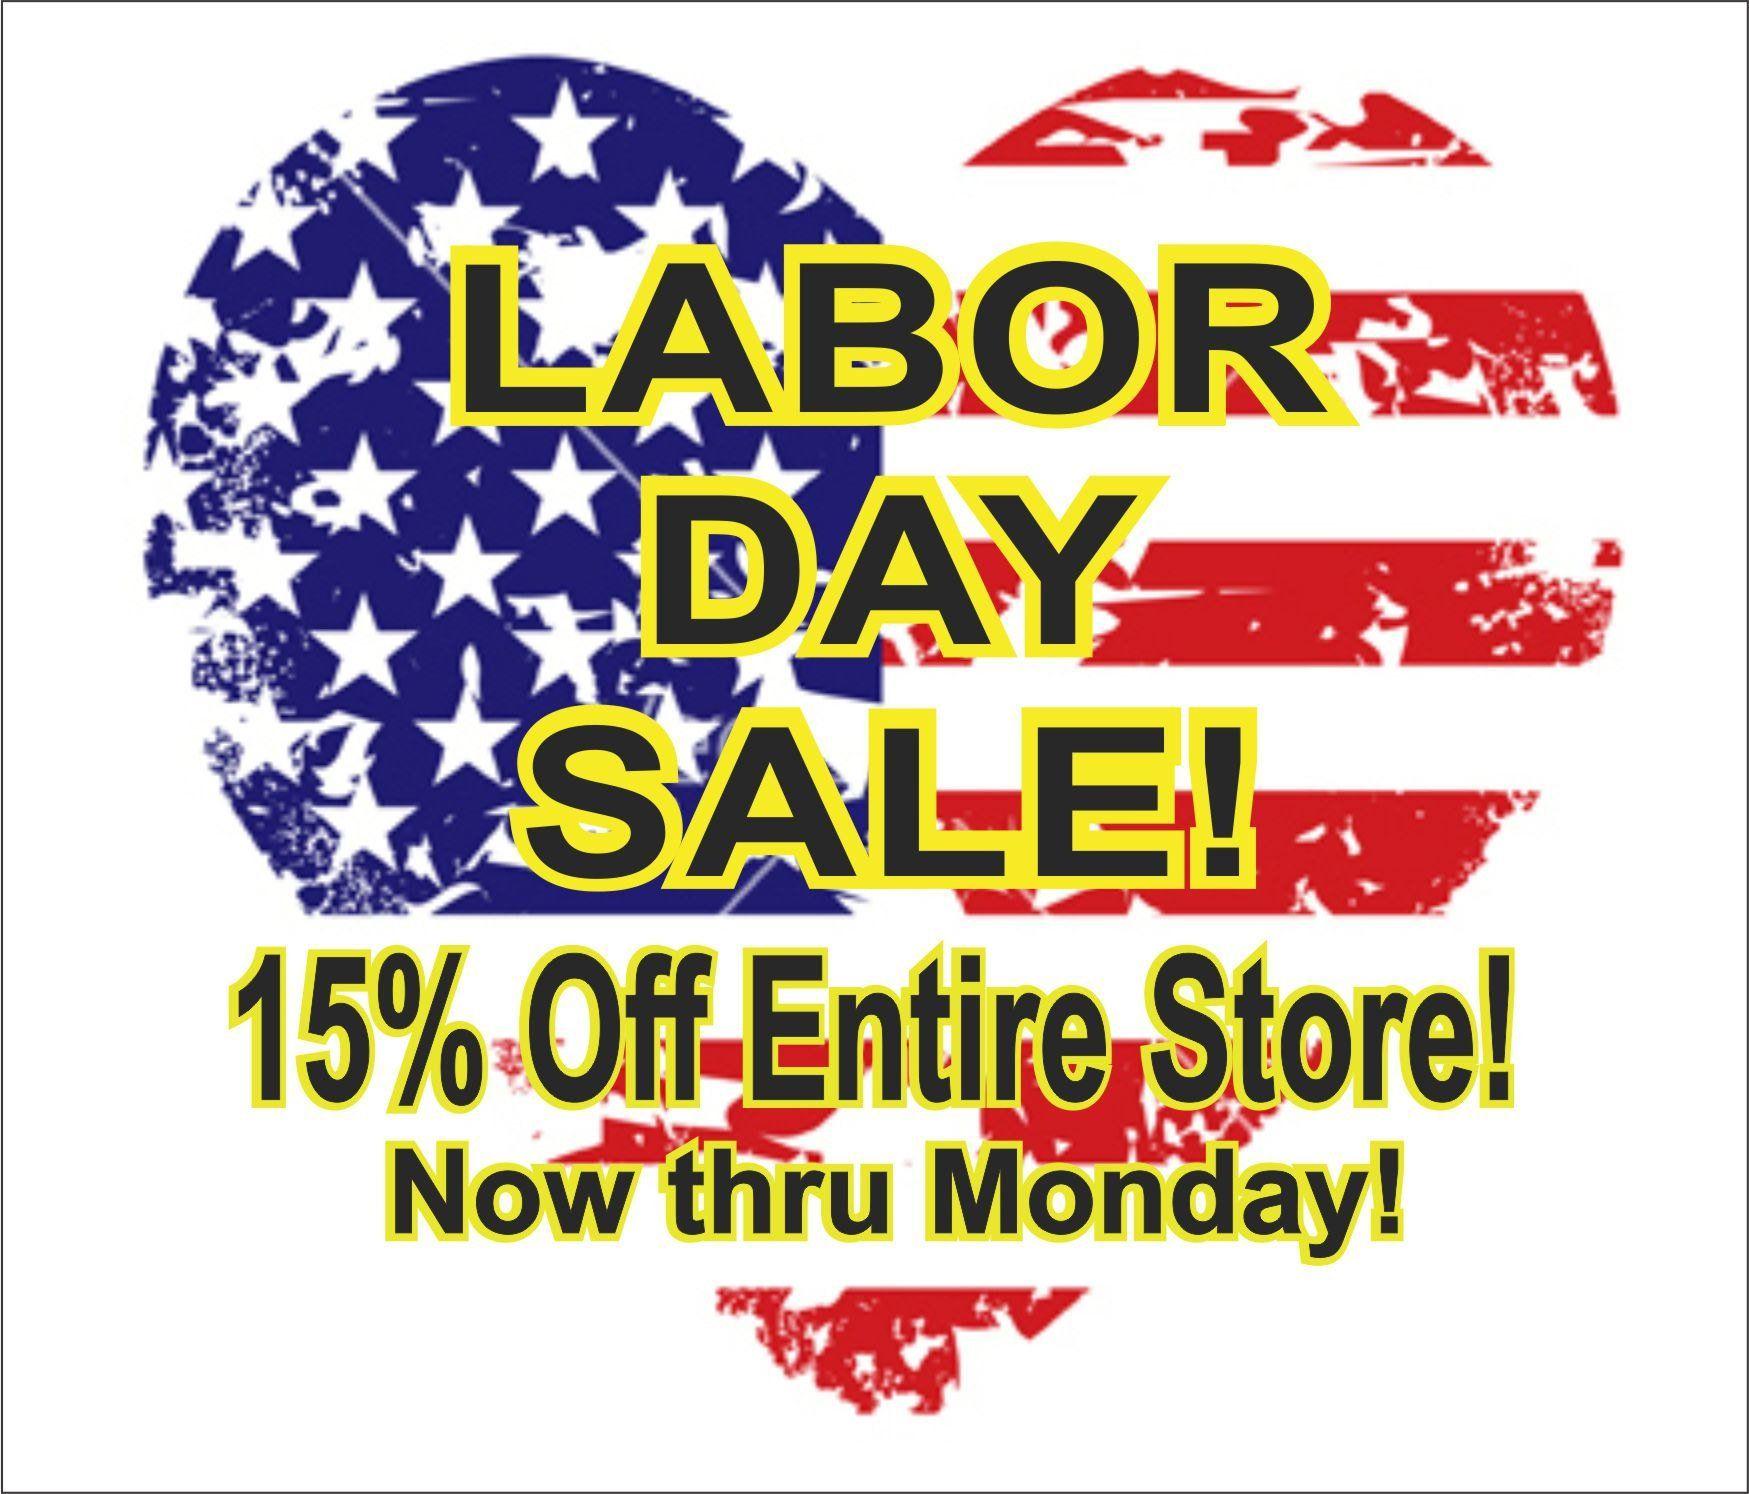 1nerdcreationssy Entire Store 15 Off Thru Monday